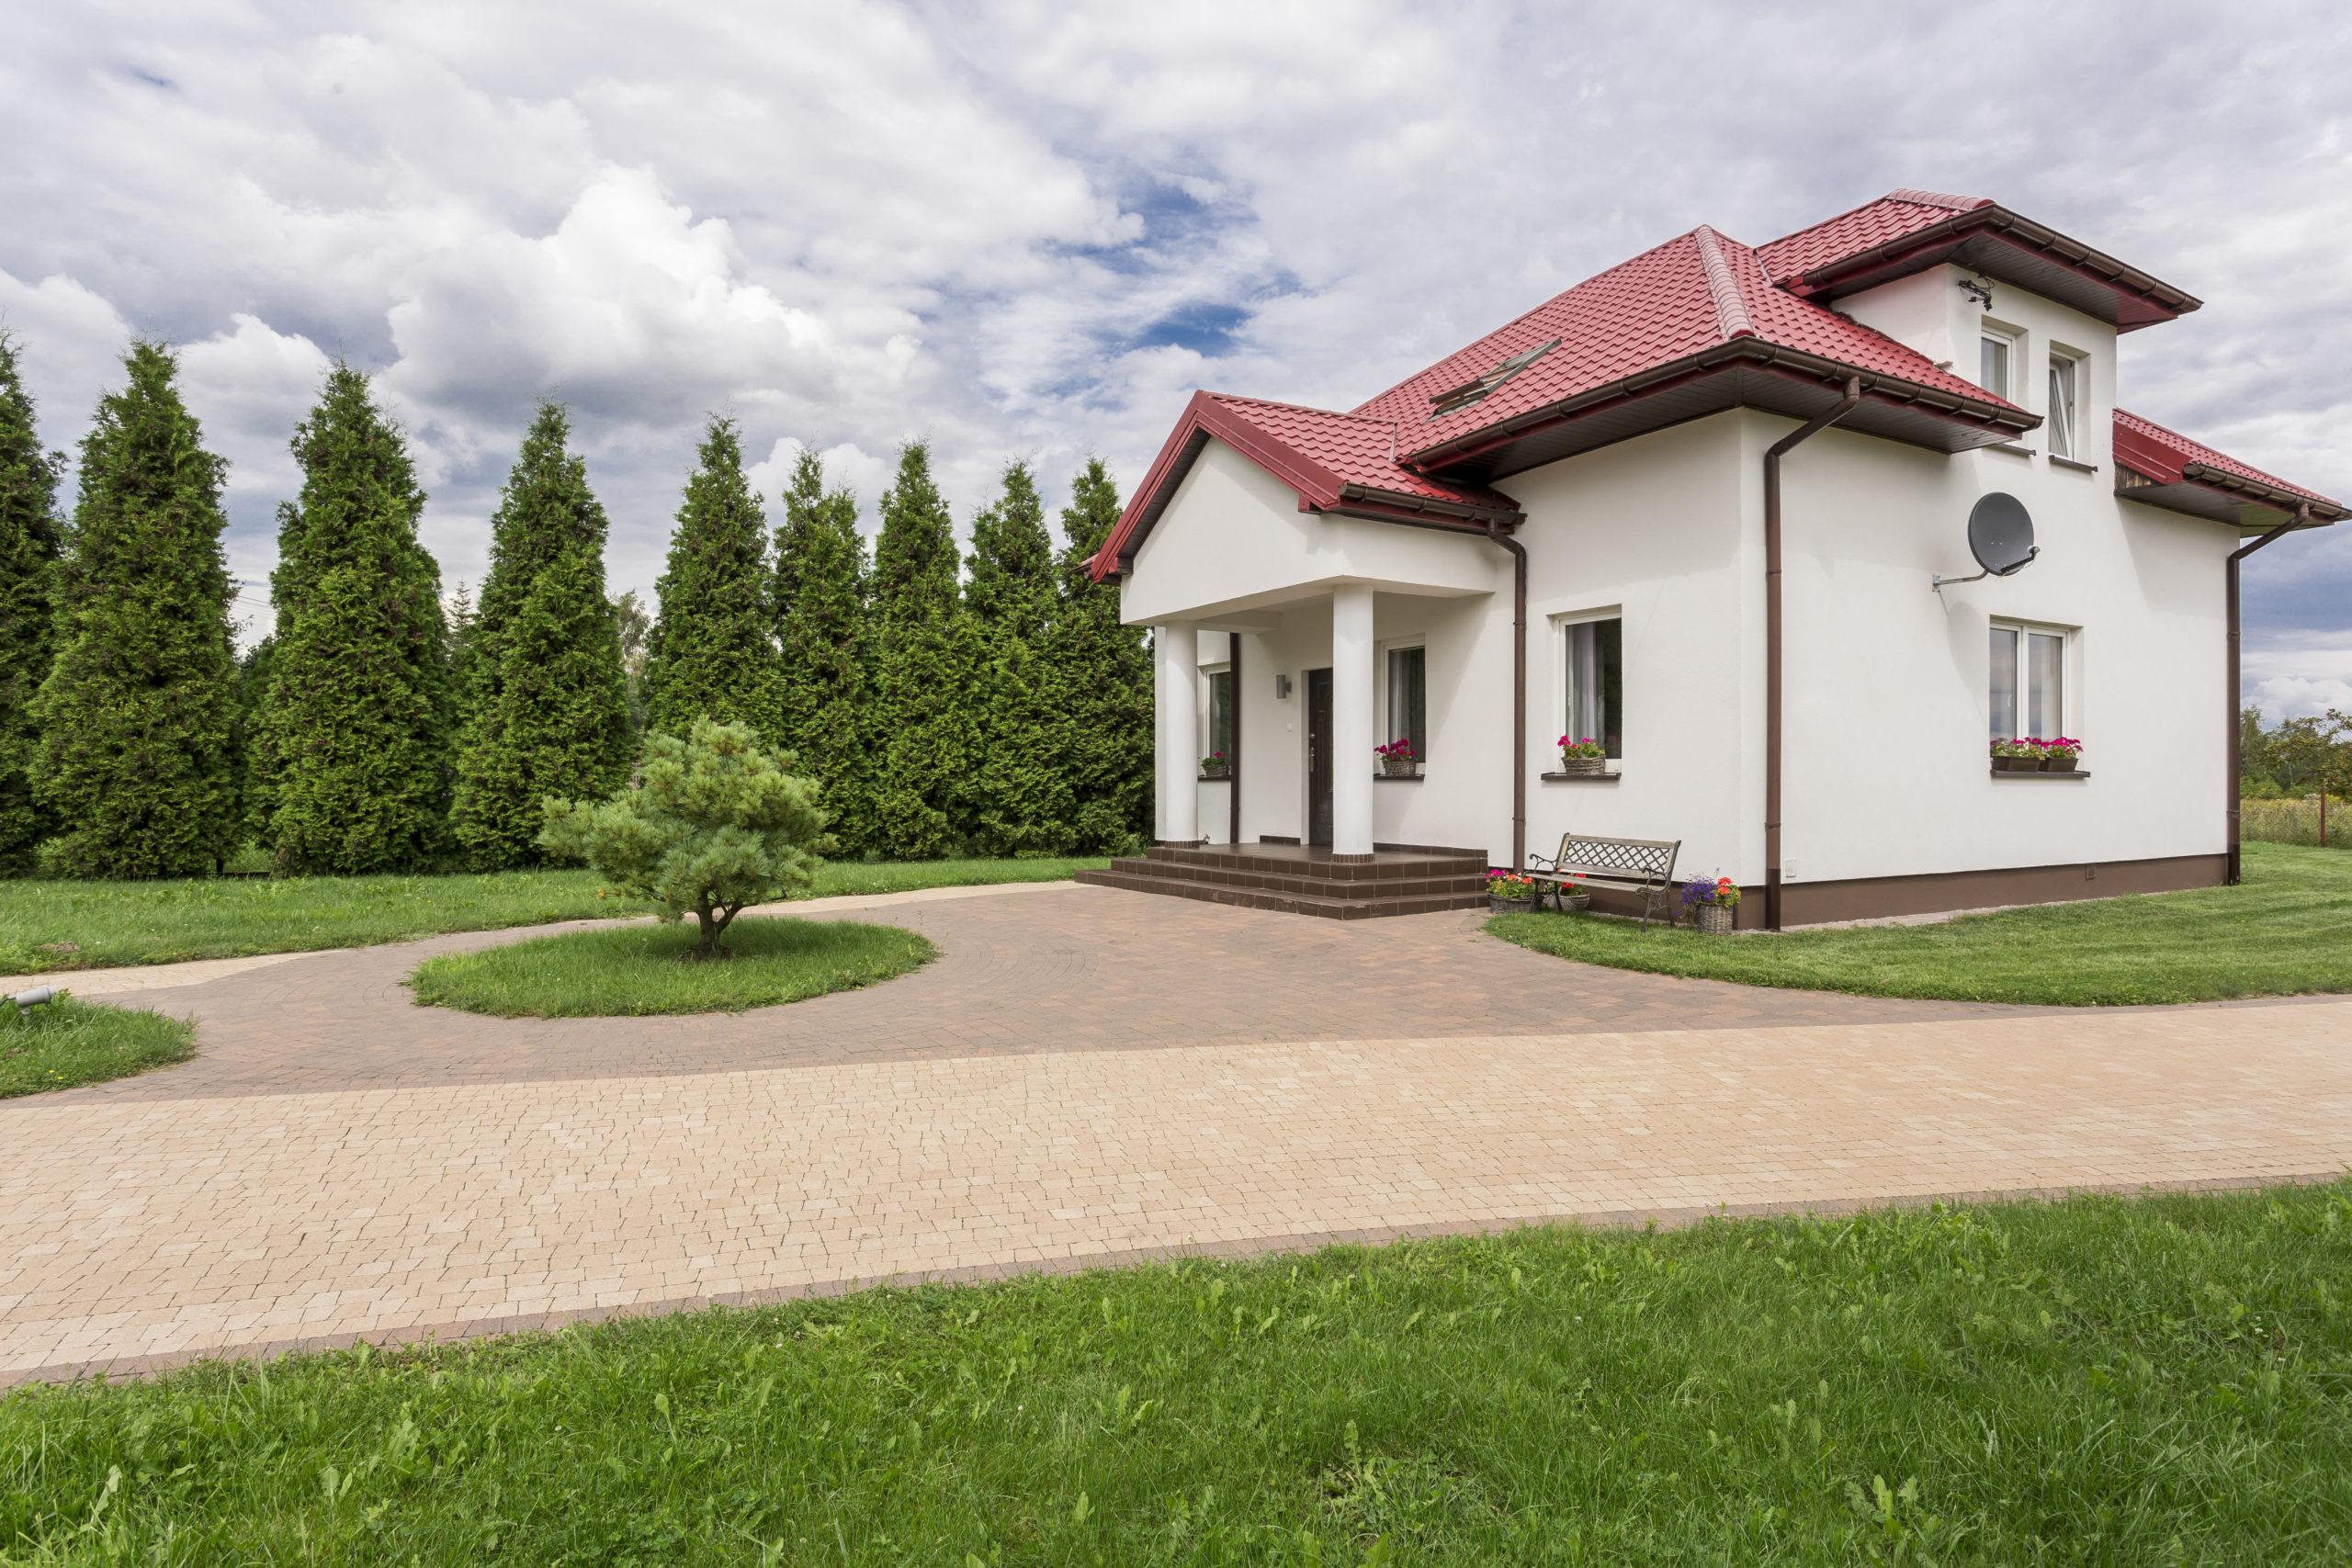 Maison bourgeoise avec jardin - SARL CDI